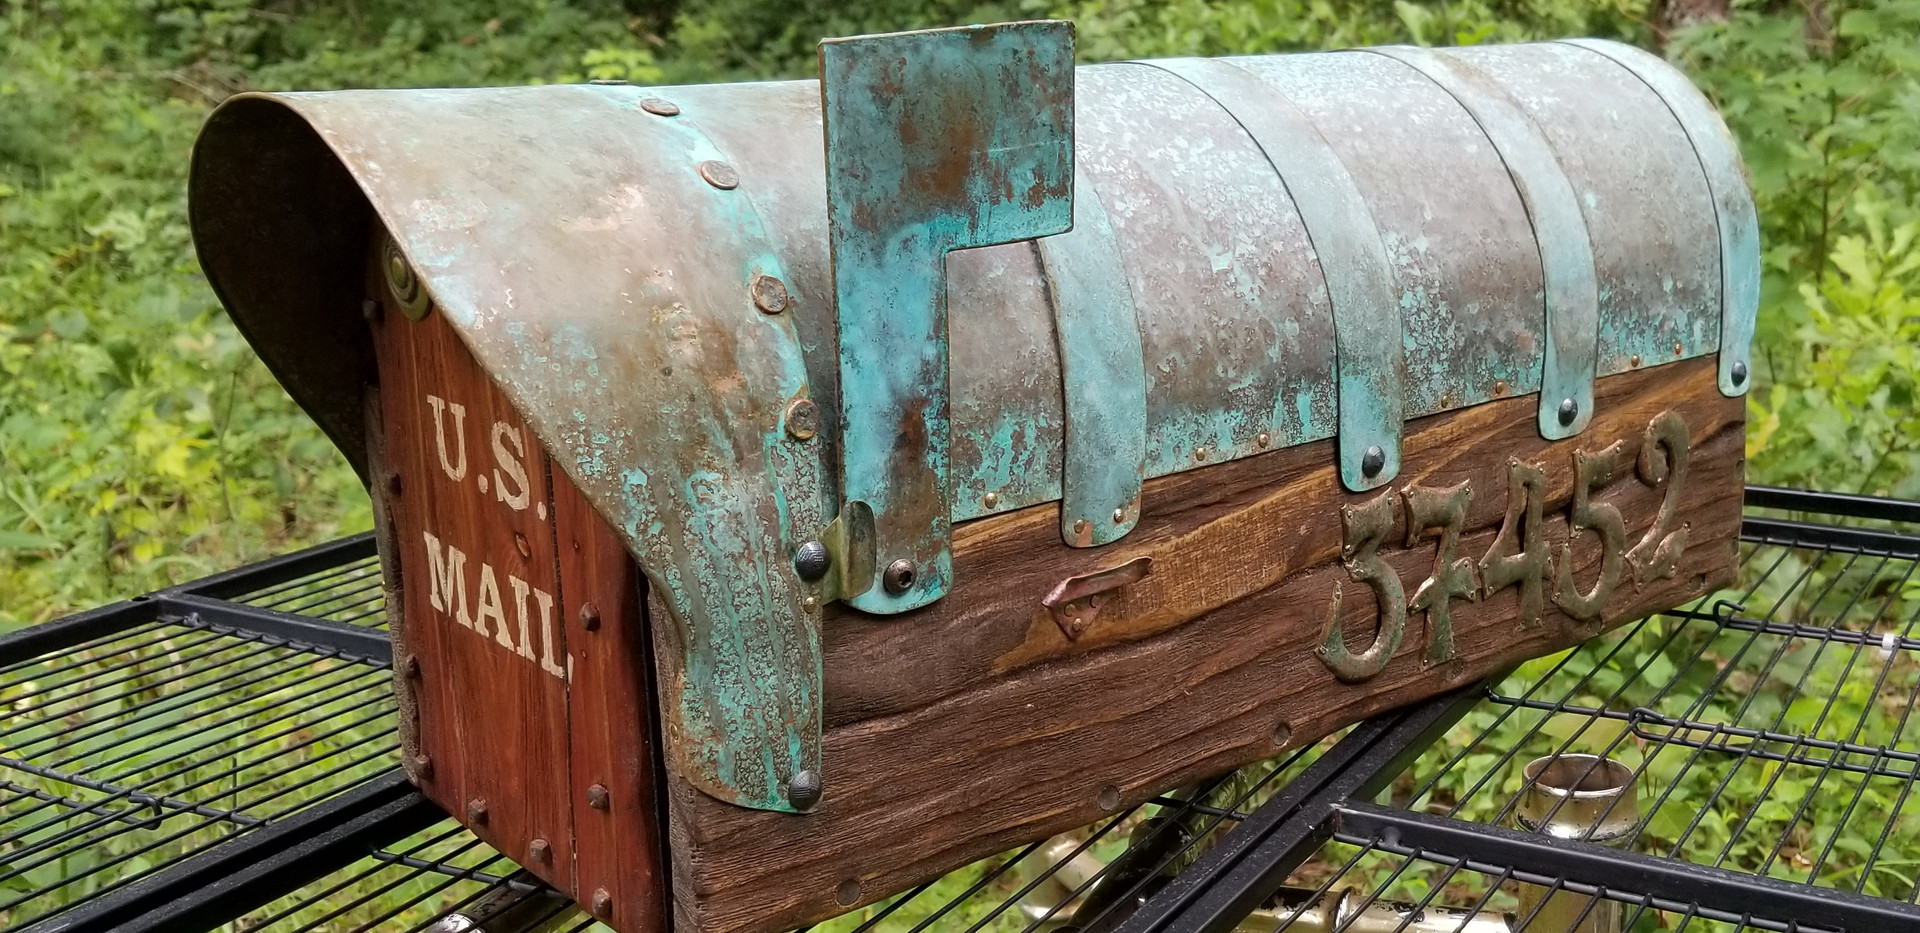 Rustic Mailbox Copper Roof